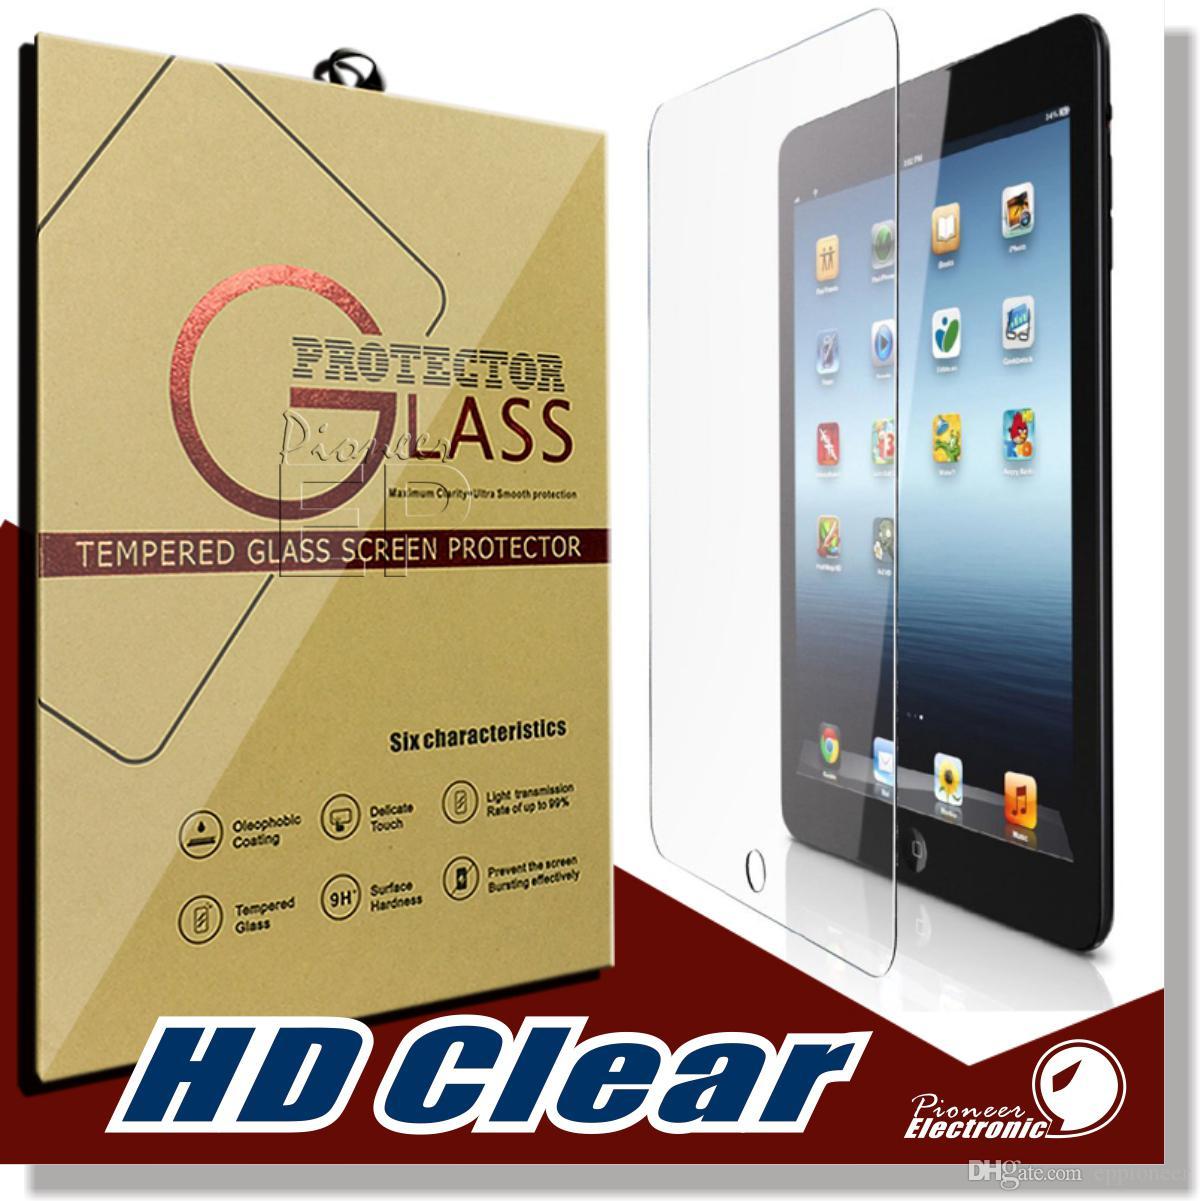 iPad Mini 2 3 4 공기 PRO 9.7 인치 화면 보호기 Shatterproof 방지 스크래치 HD Clear iPad Mini 2/3 iPad 공기 강화 유리